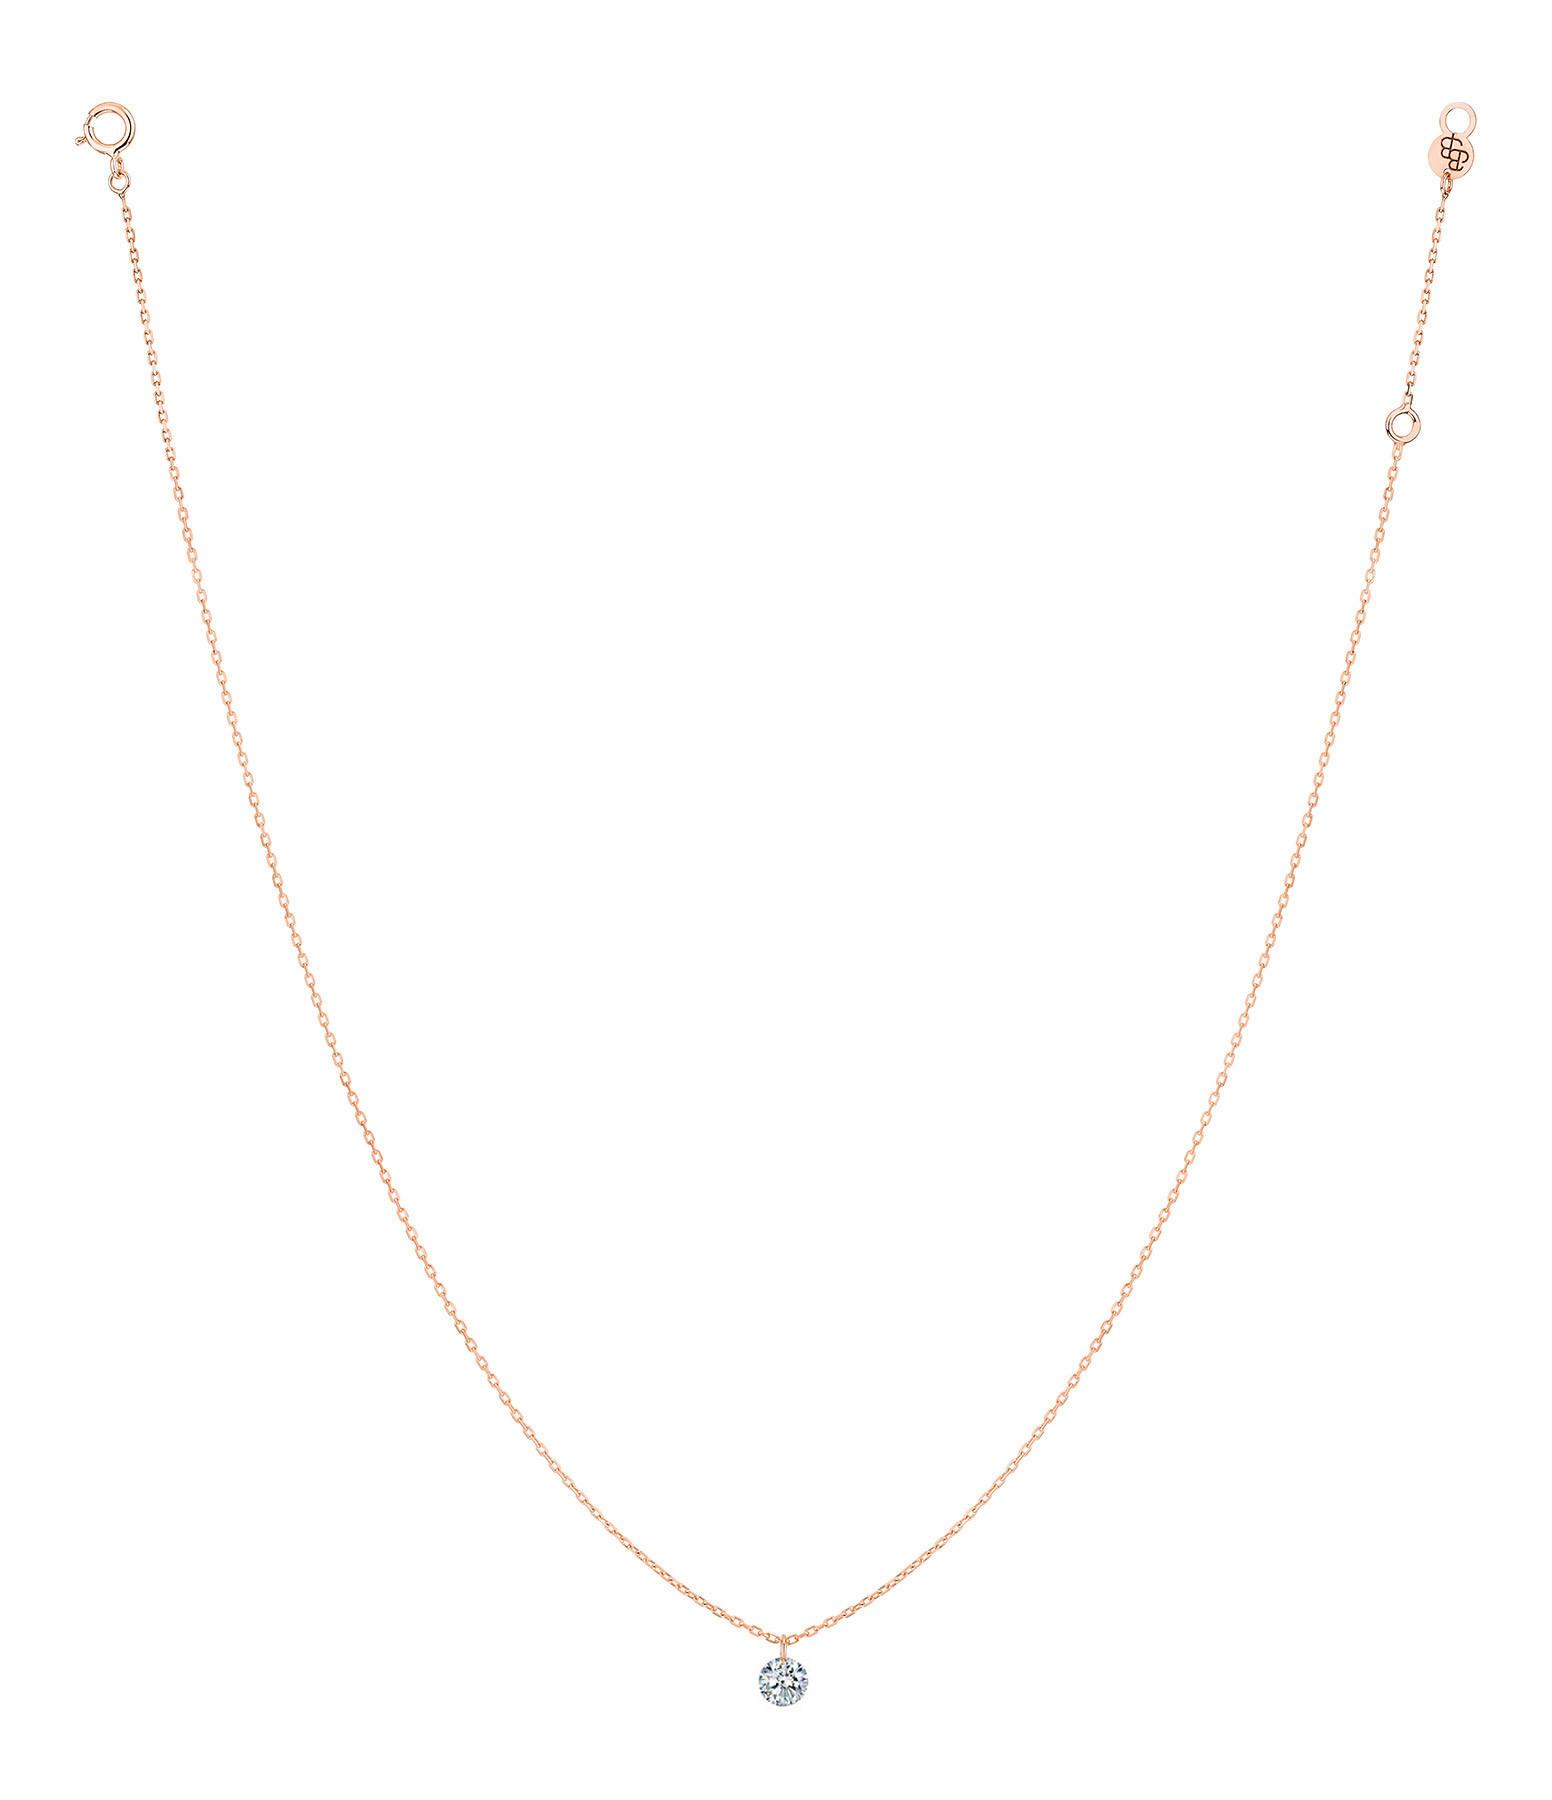 LA BRUNE & LA BLONDE - Collier 360° Diamant Brillant 0,20 Or Rose